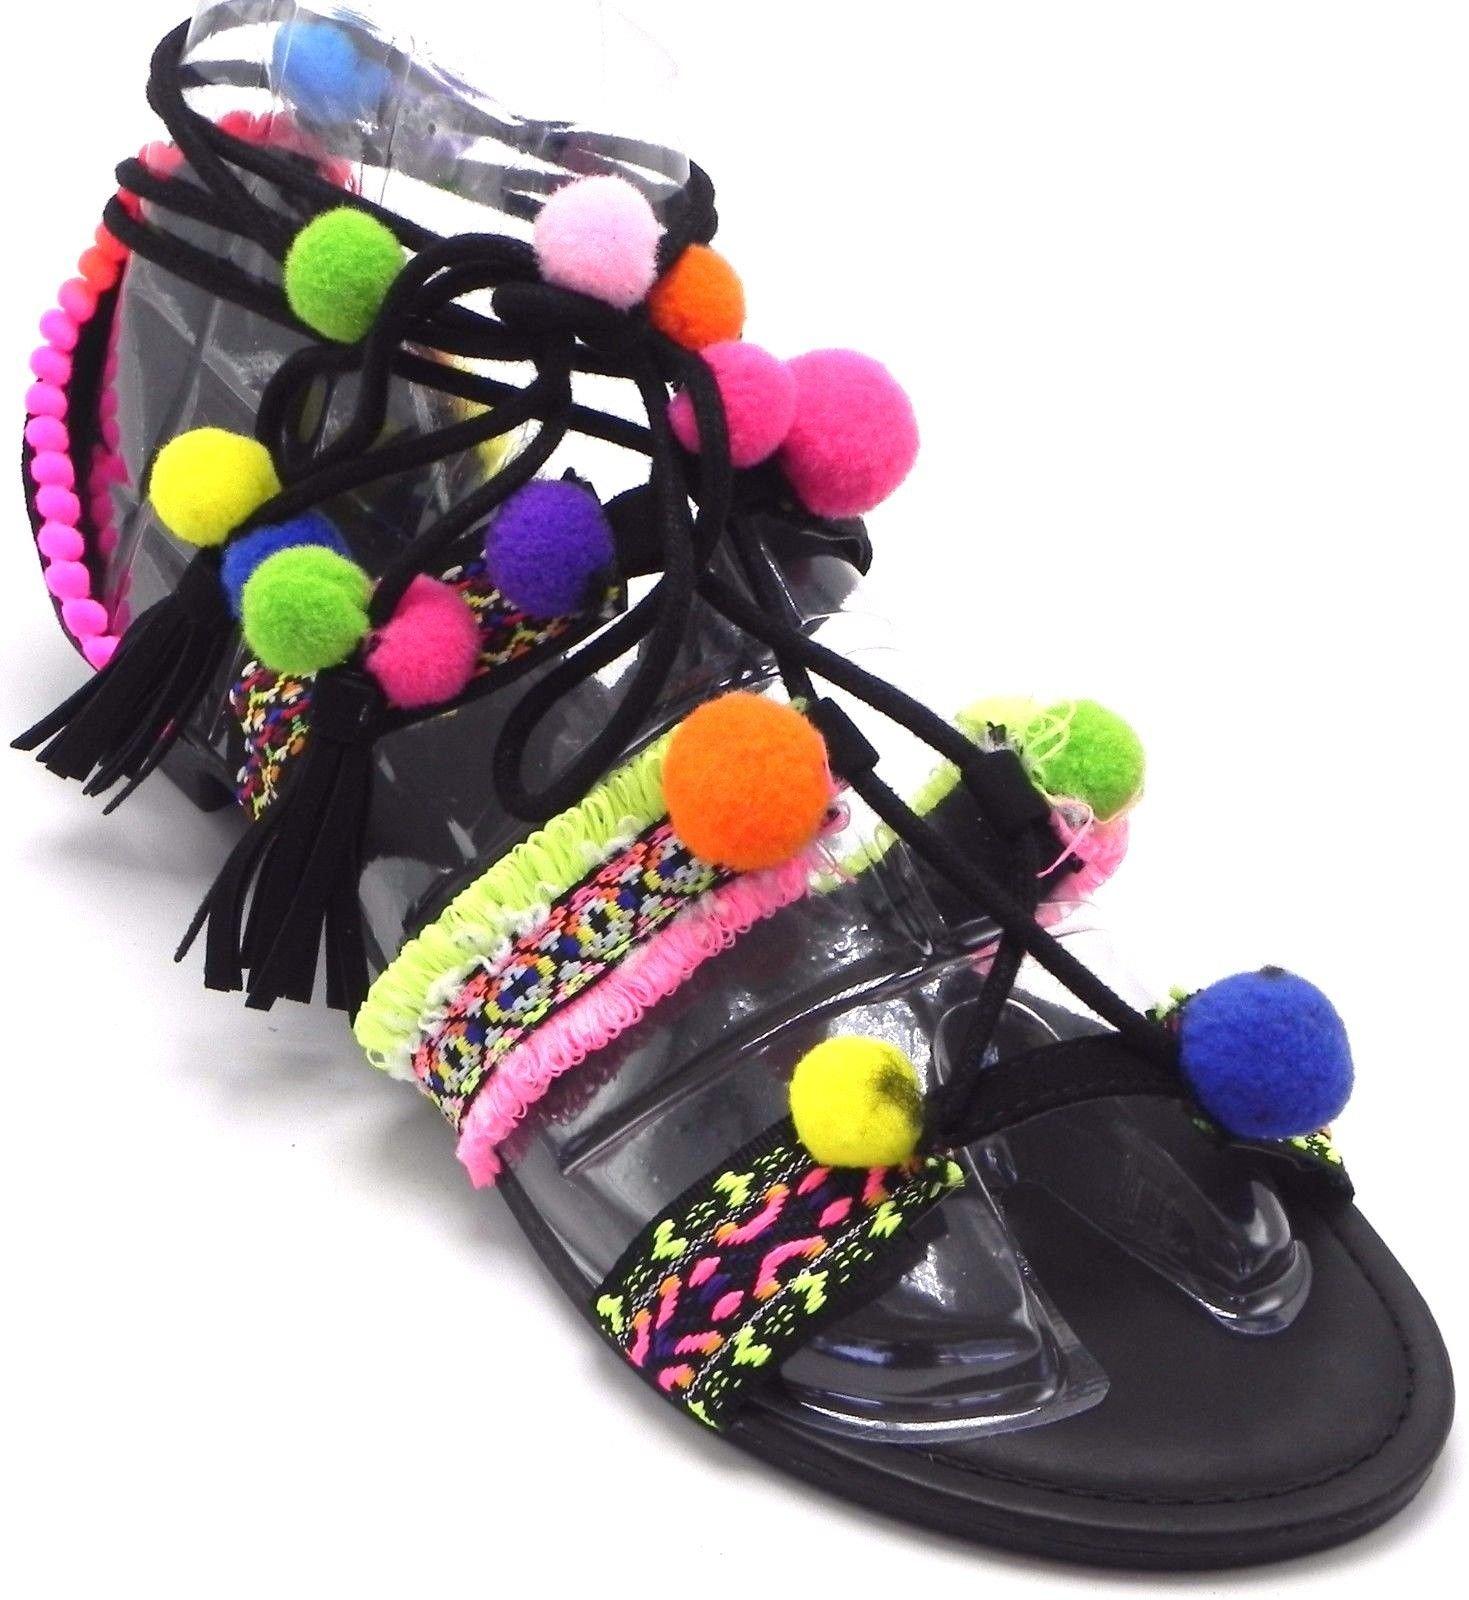 Bamboo Forever Women's Pom-Pom Flip Flop Bohemia Thong Gili Tie Wrap Lollipop Colorful Flat Sandal Shoes